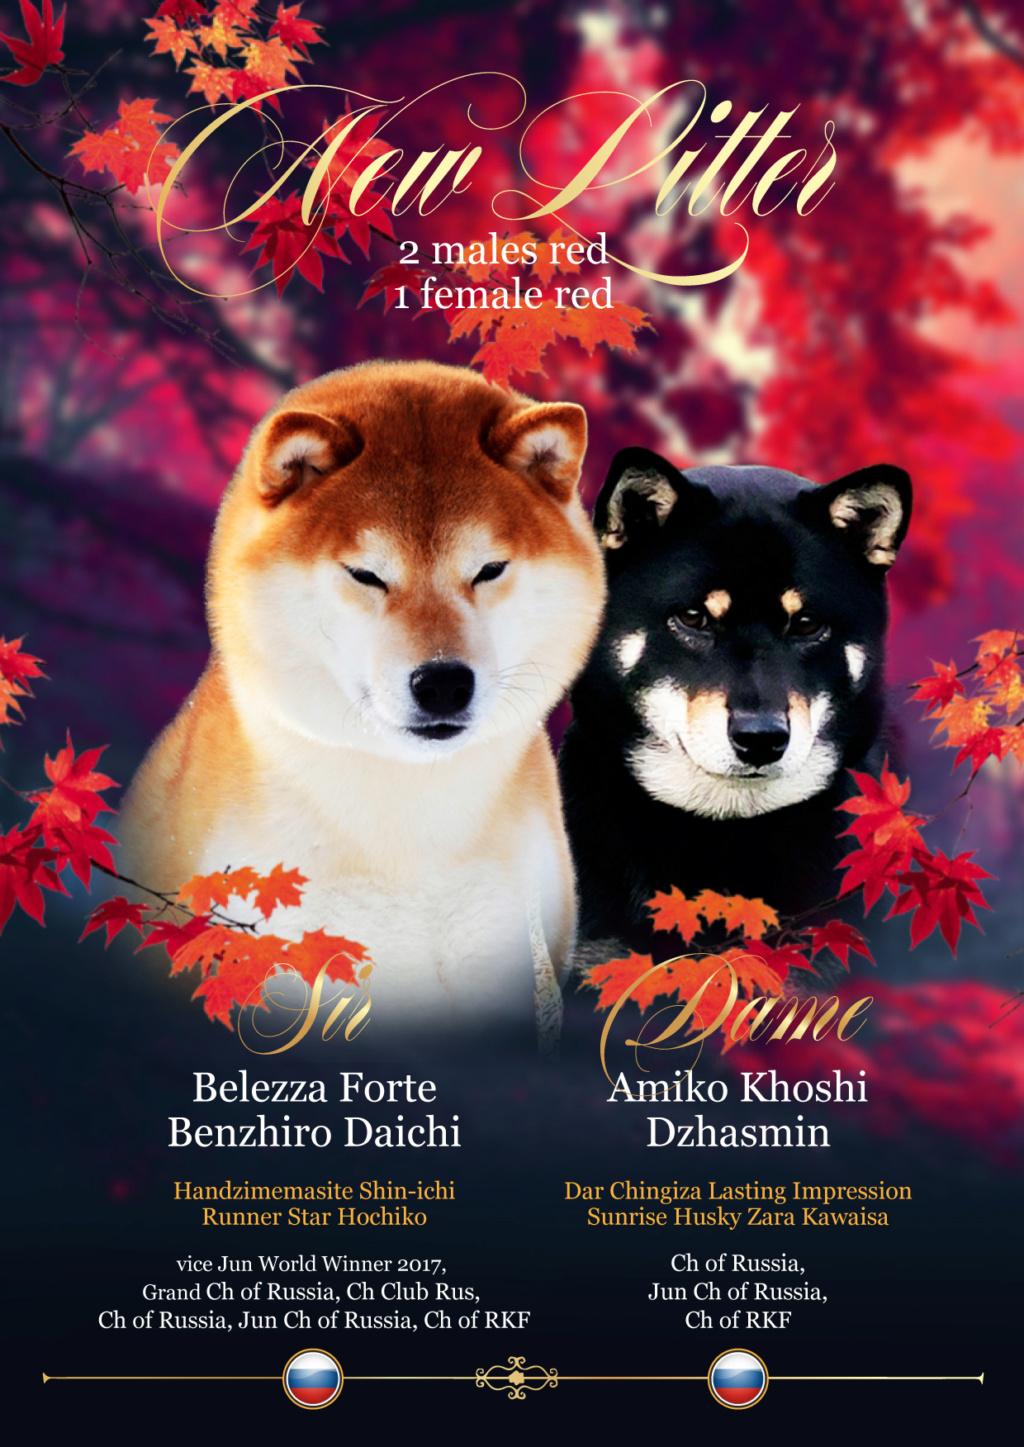 Belezza Forte Benzhiro Daichi (Зуко) - Страница 4 Aaau_110